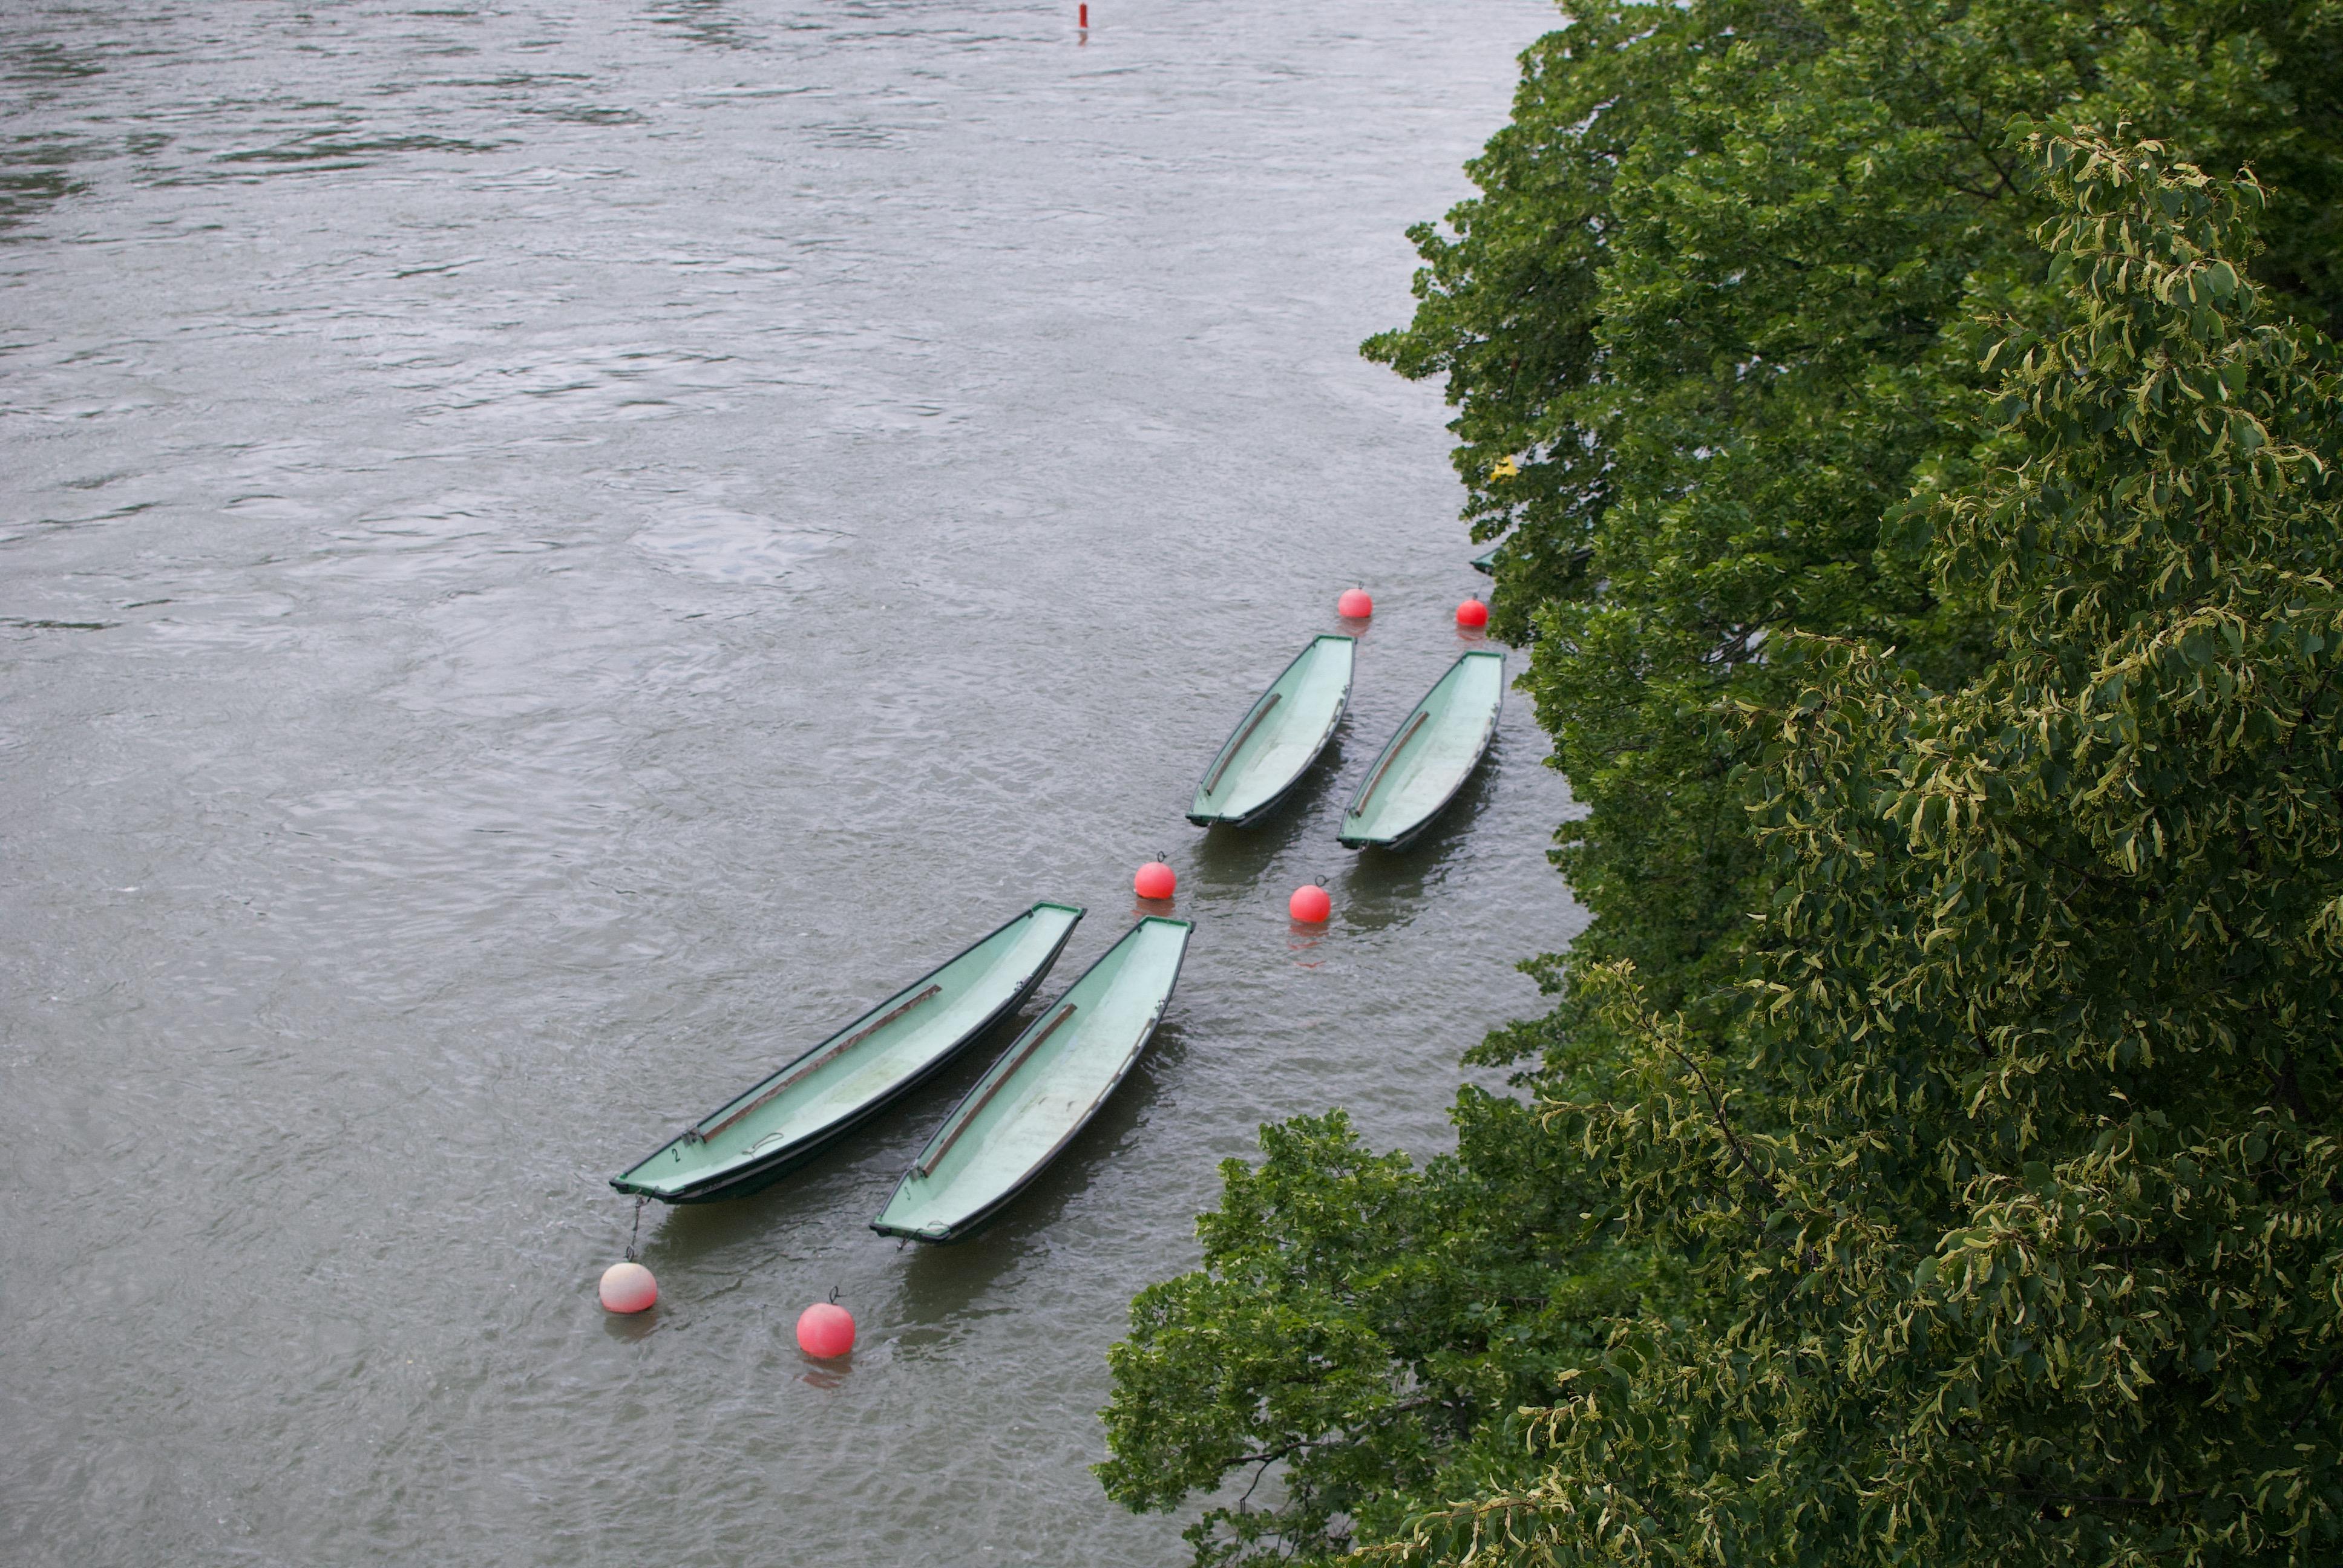 Les canoës du Rhin.jpeg